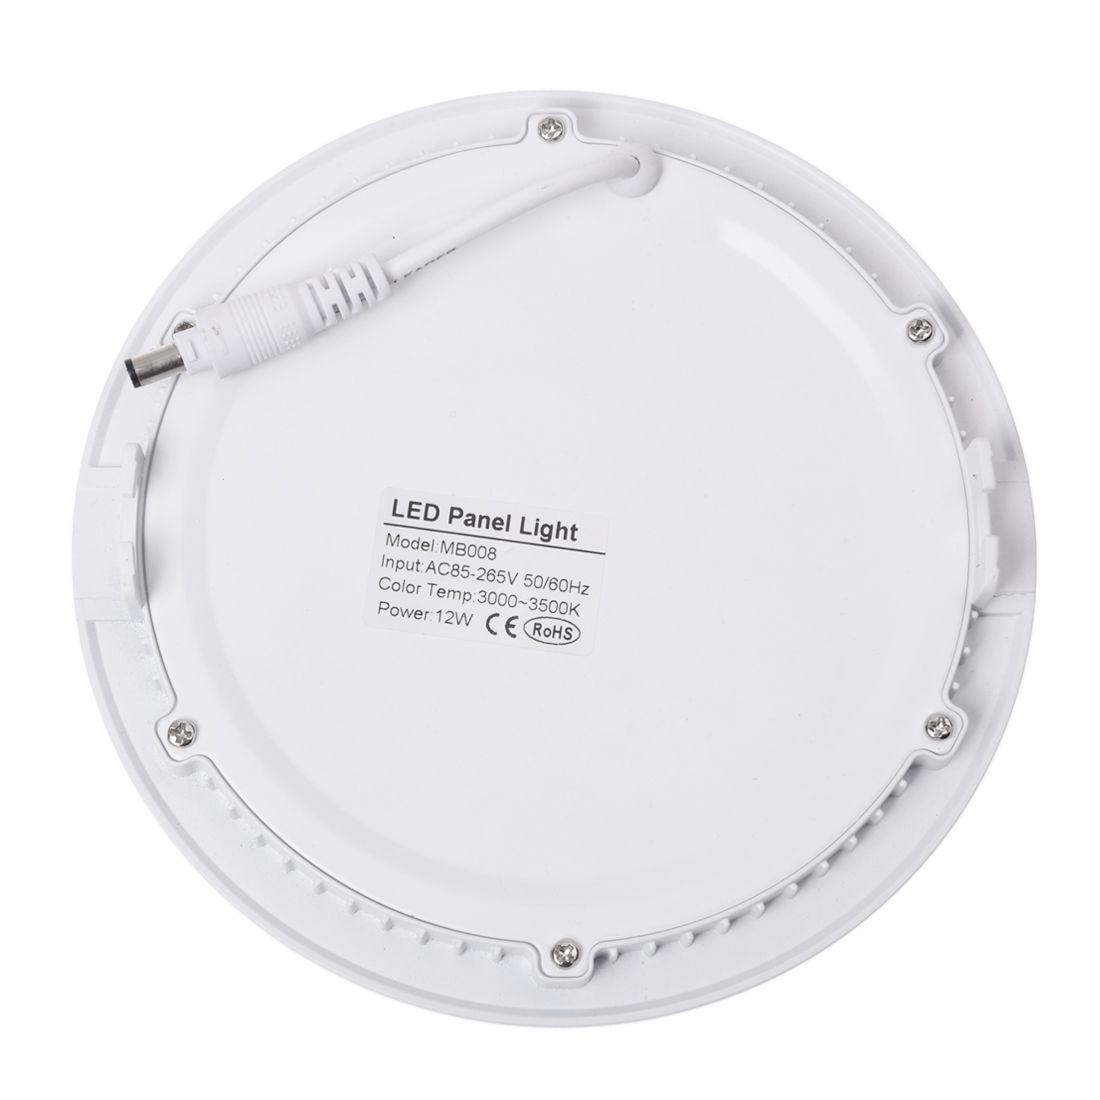 12W LED 2835 SMD panel lamp down light ceiling lights dimming LED 3000K Warm White